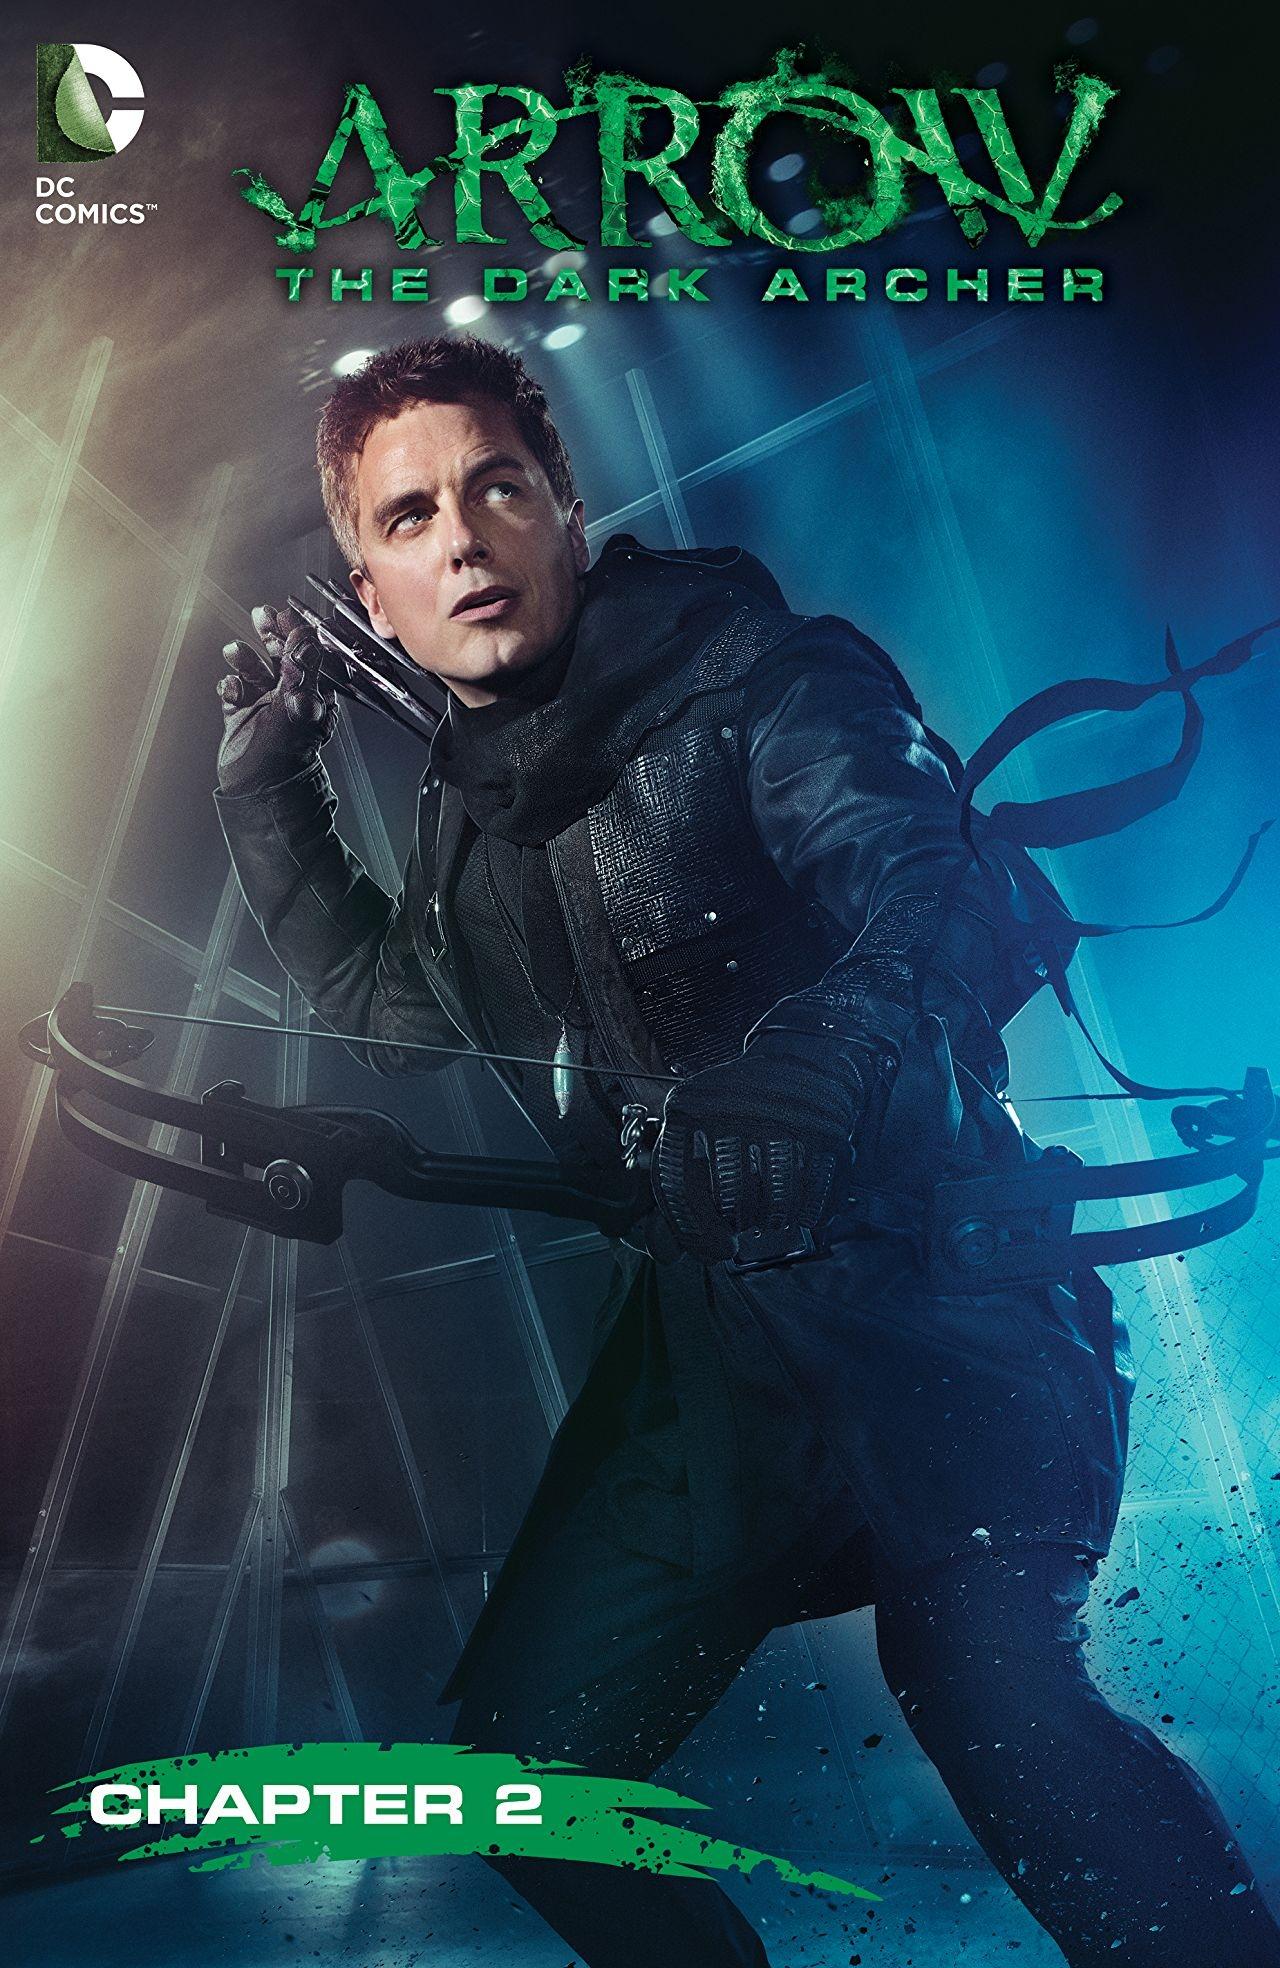 Arrow: The Dark Archer Vol 1 2 (Digital)